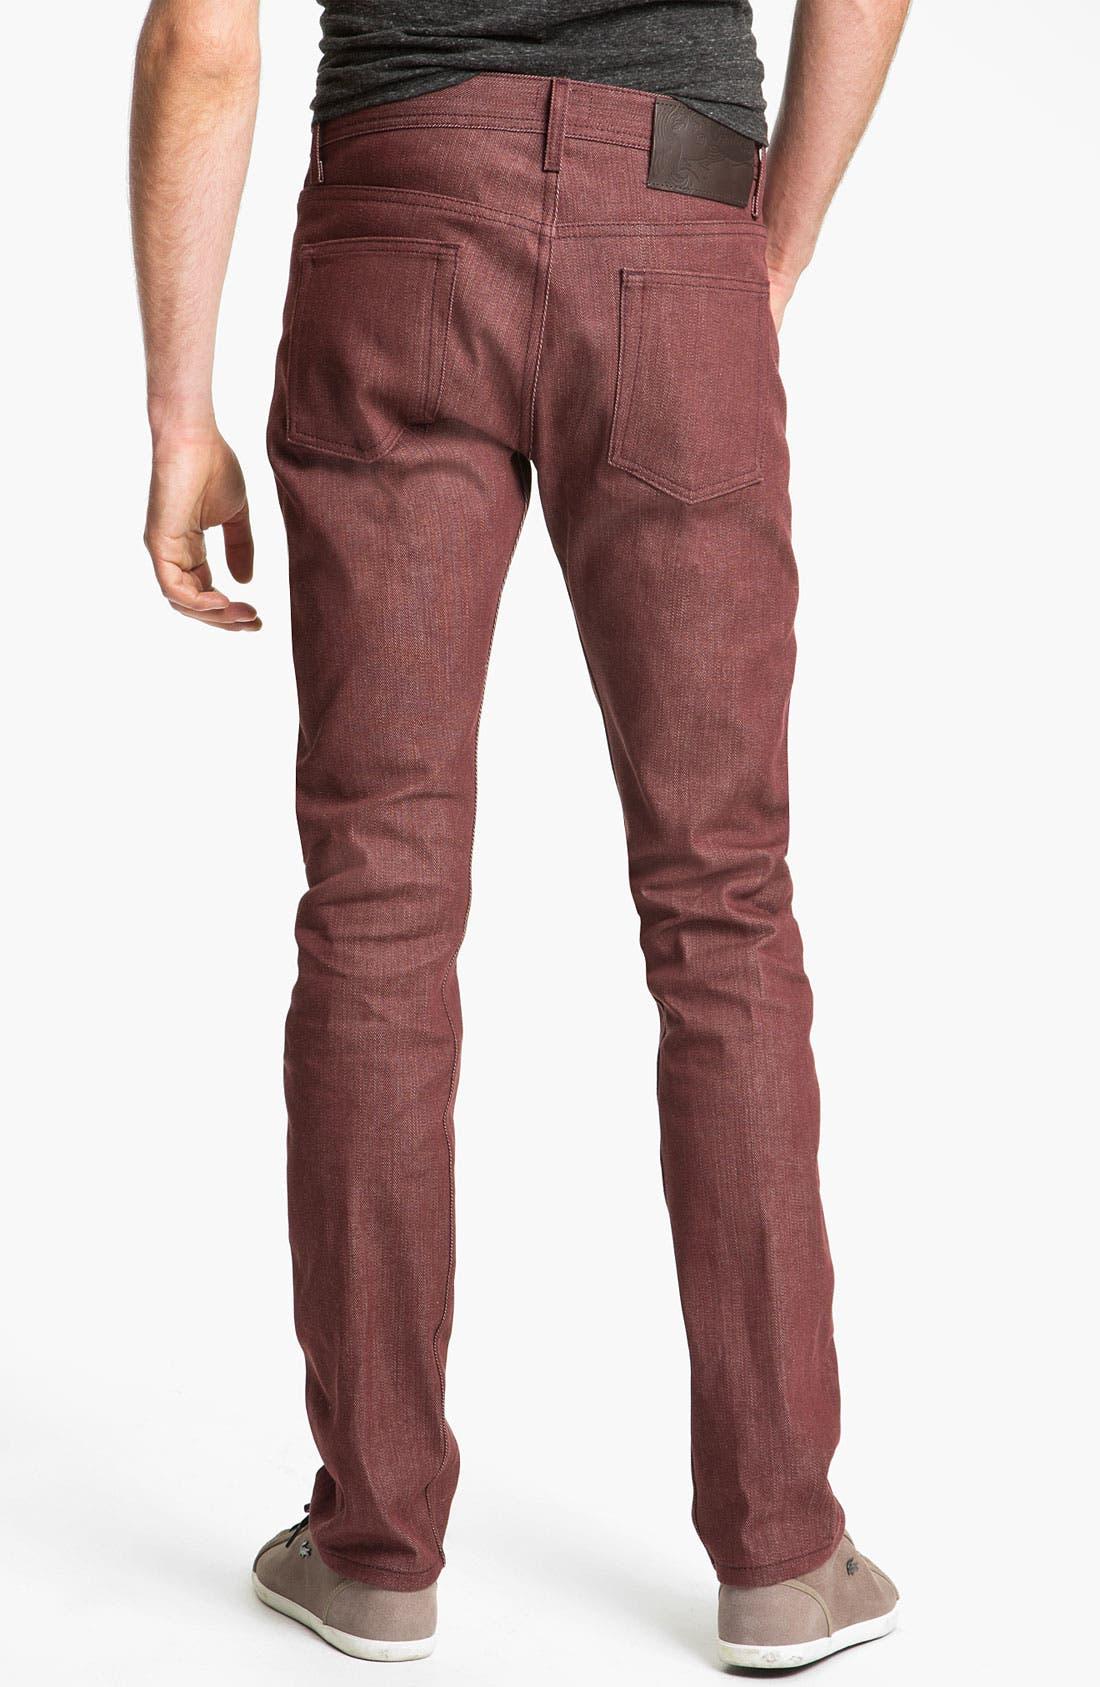 Main Image - Naked & Famous Denim 'Weird Guy' Slim Tapered Leg Selvedge Jeans (Pomegranate Red)